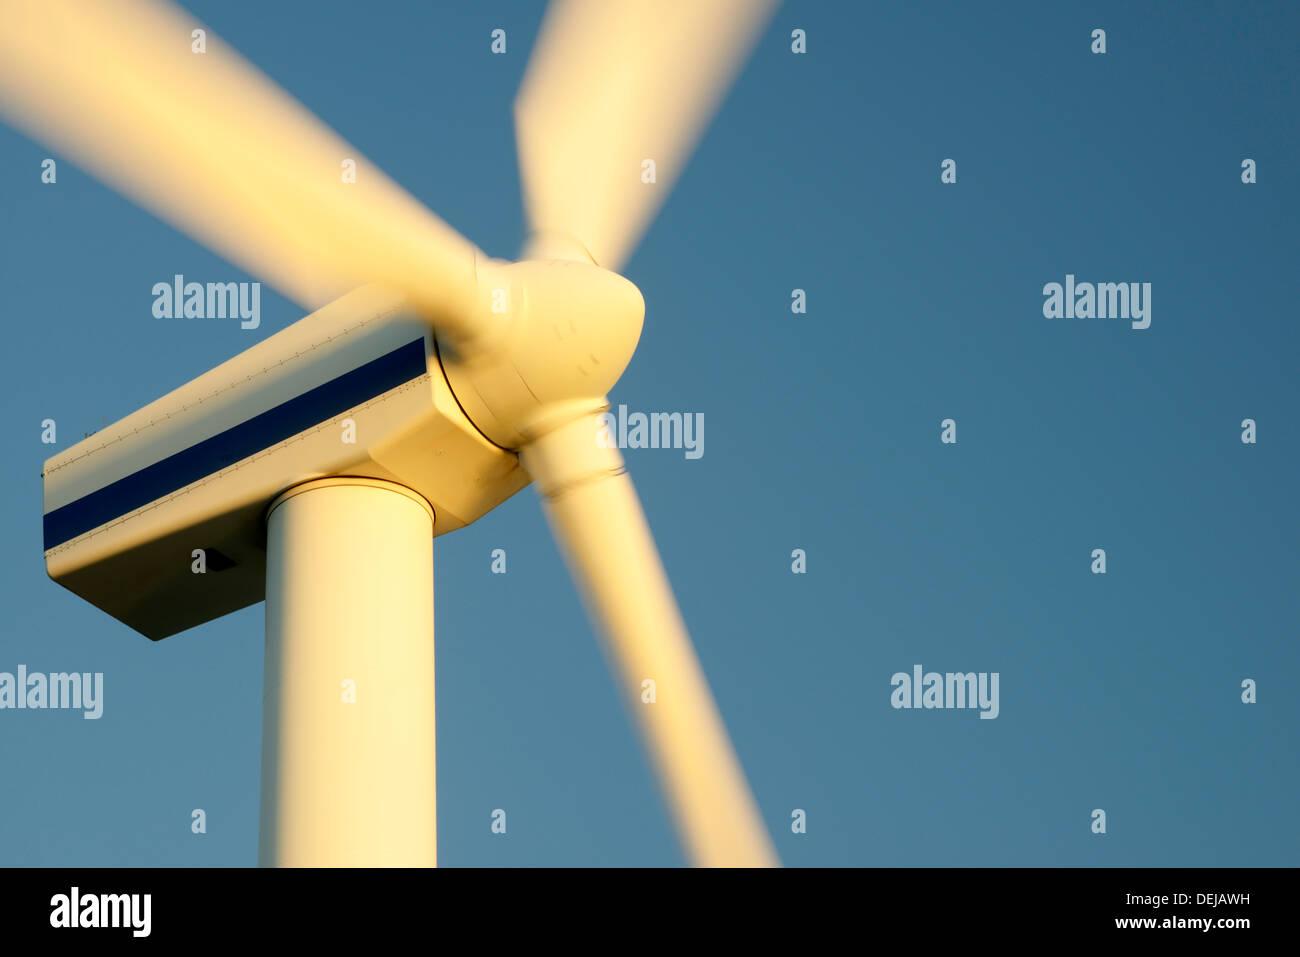 Wind turbine rotors with blue sky generating electricity on wind farm at Workington, Cumbria, England, UK. Warm evening light - Stock Image